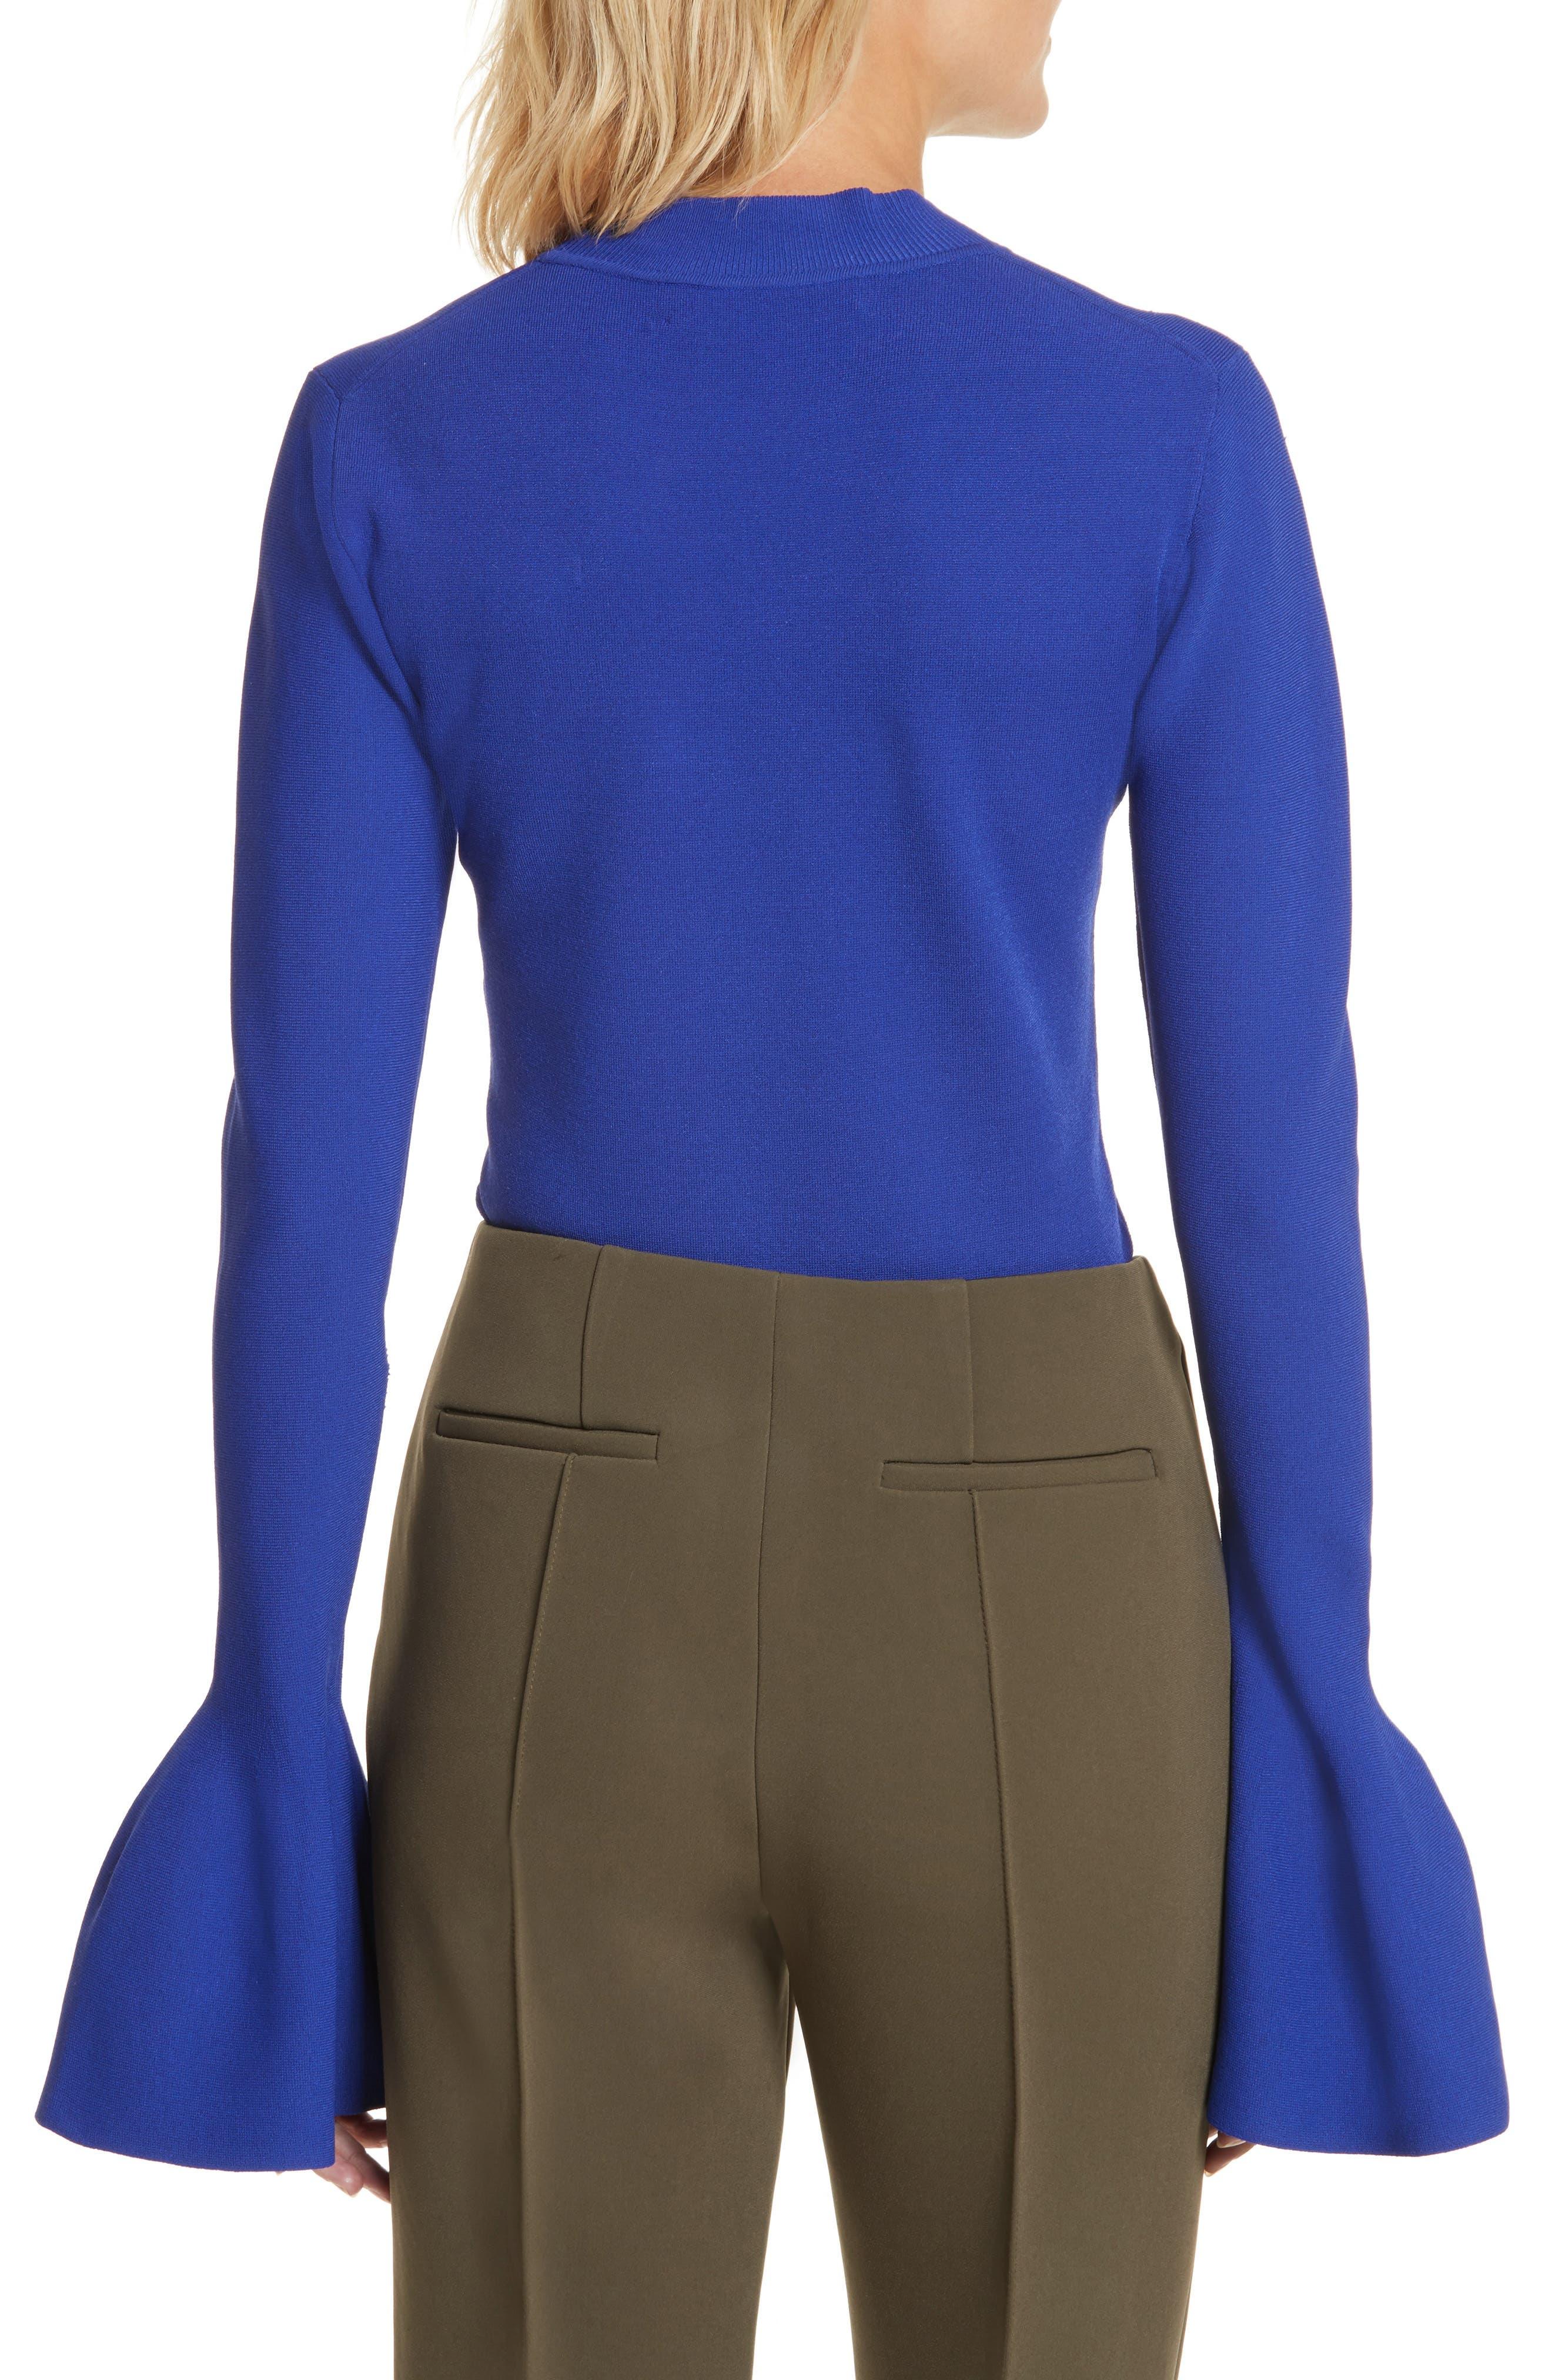 Diane von Furstenberg Flutter Sleeve Mock Neck Sweater,                             Alternate thumbnail 2, color,                             498